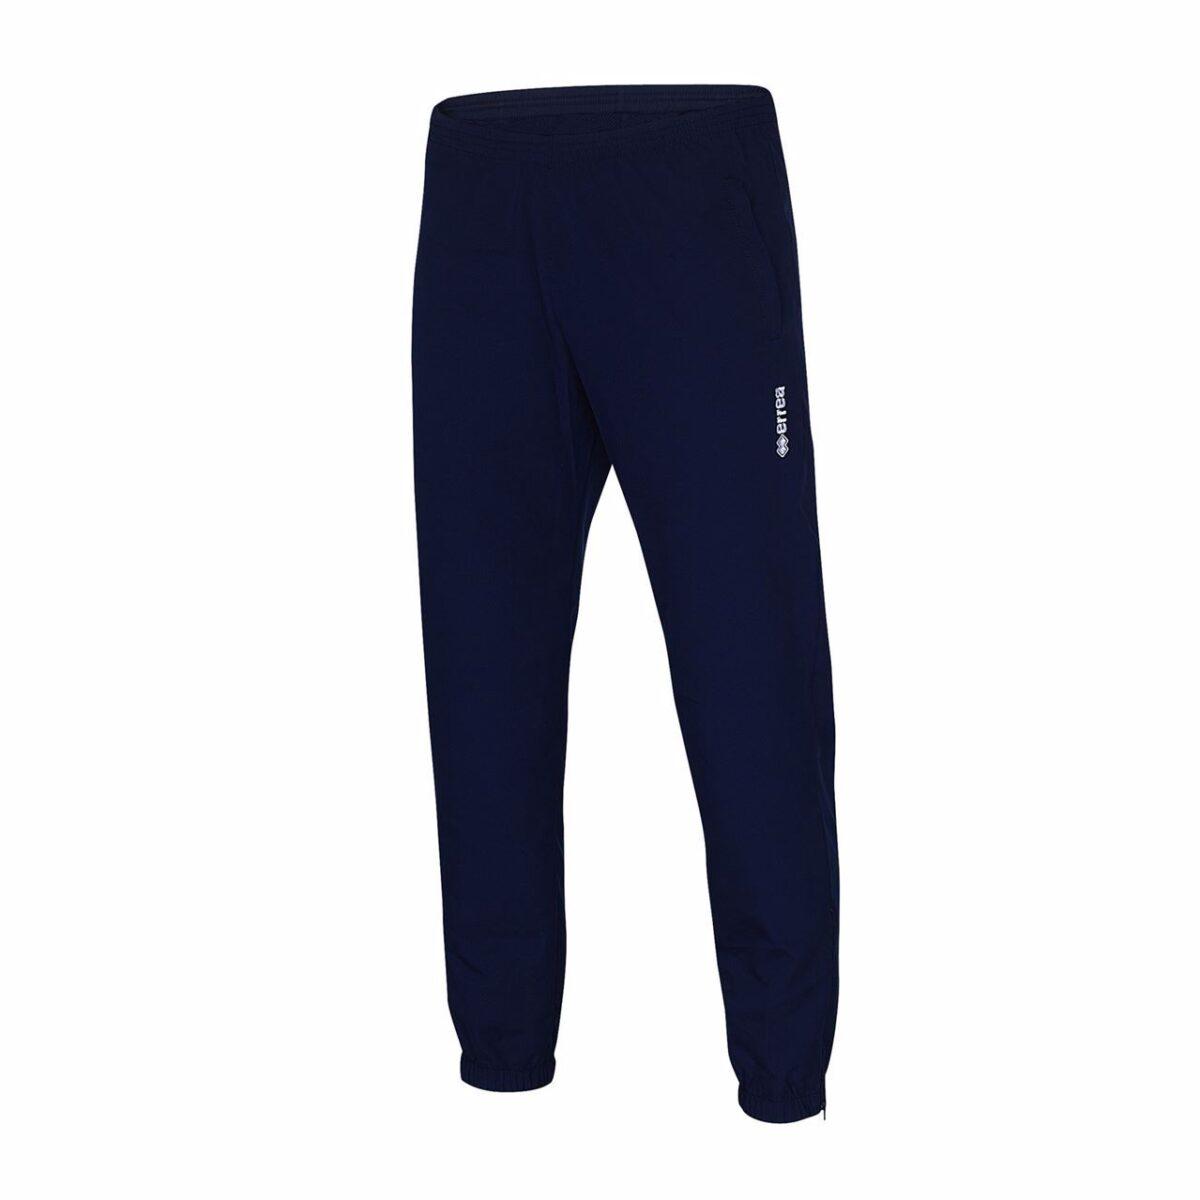 Errea AUSTIN 3.0 Junior Trackpant Trousers FP791Z